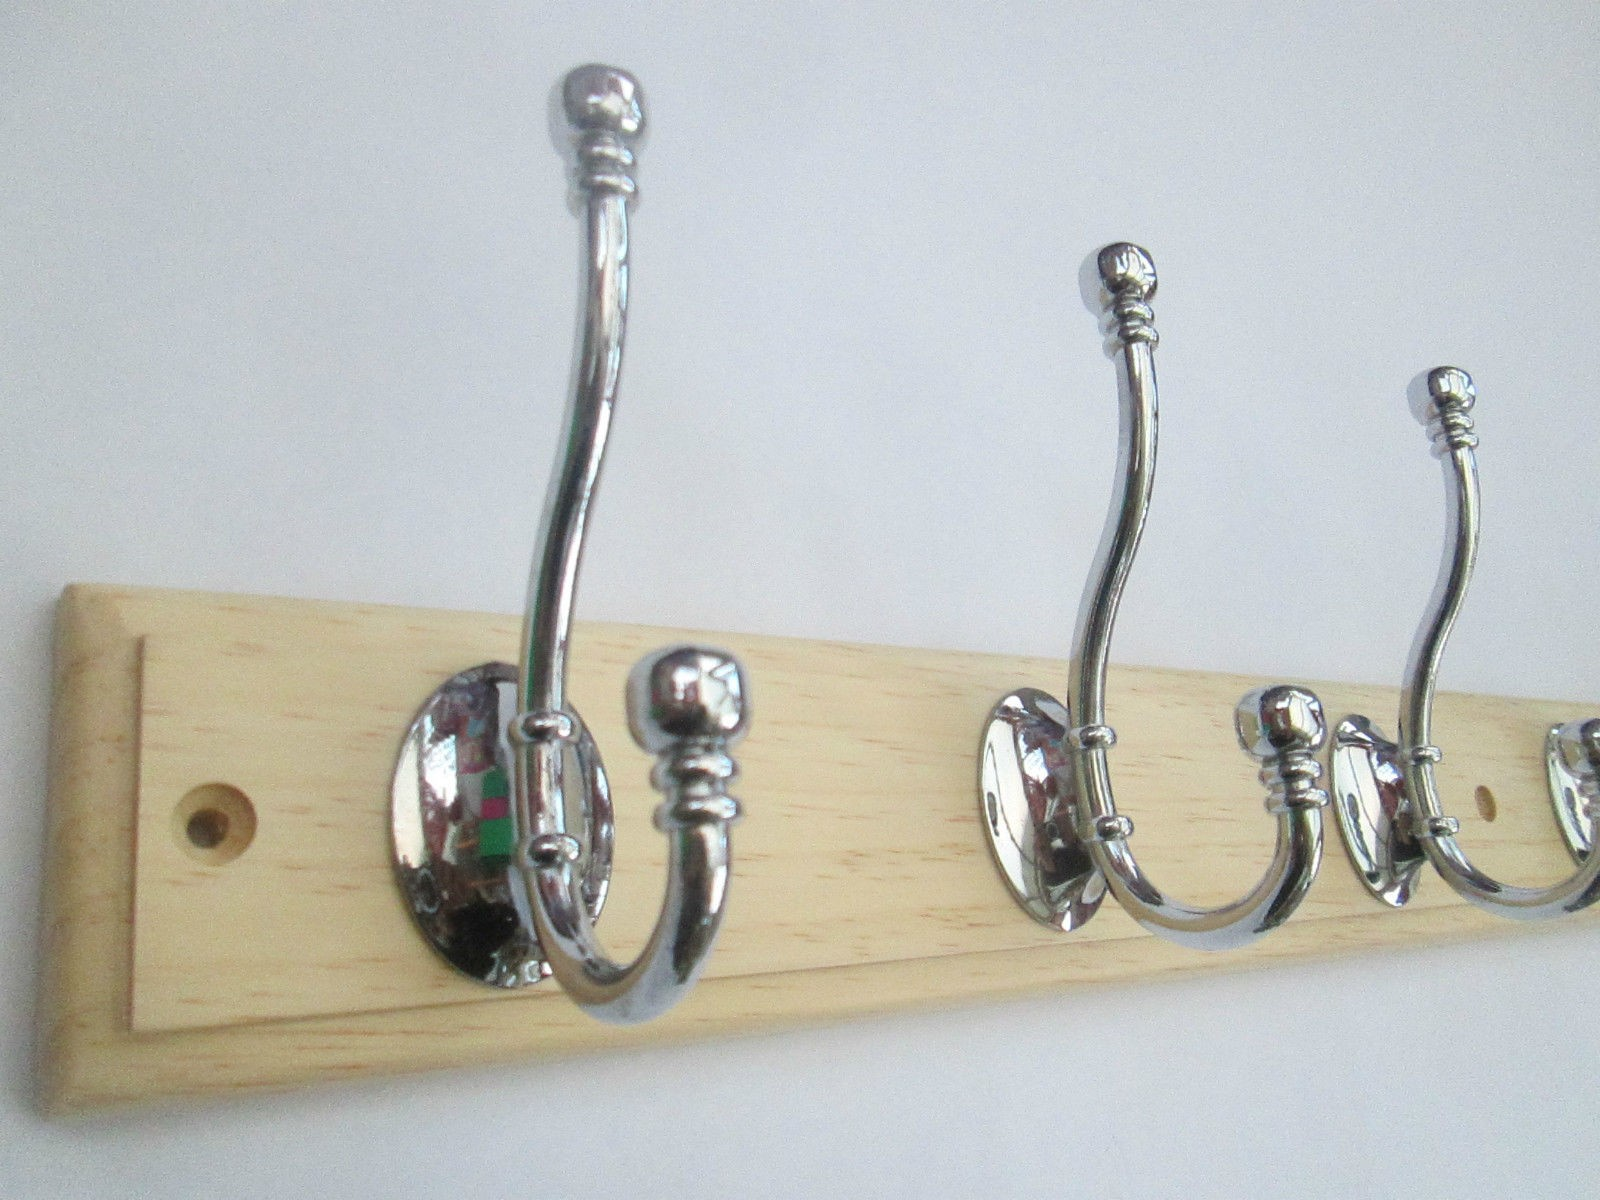 Modern Wood Coat Rack With Chrome Hooks Ironmongery World